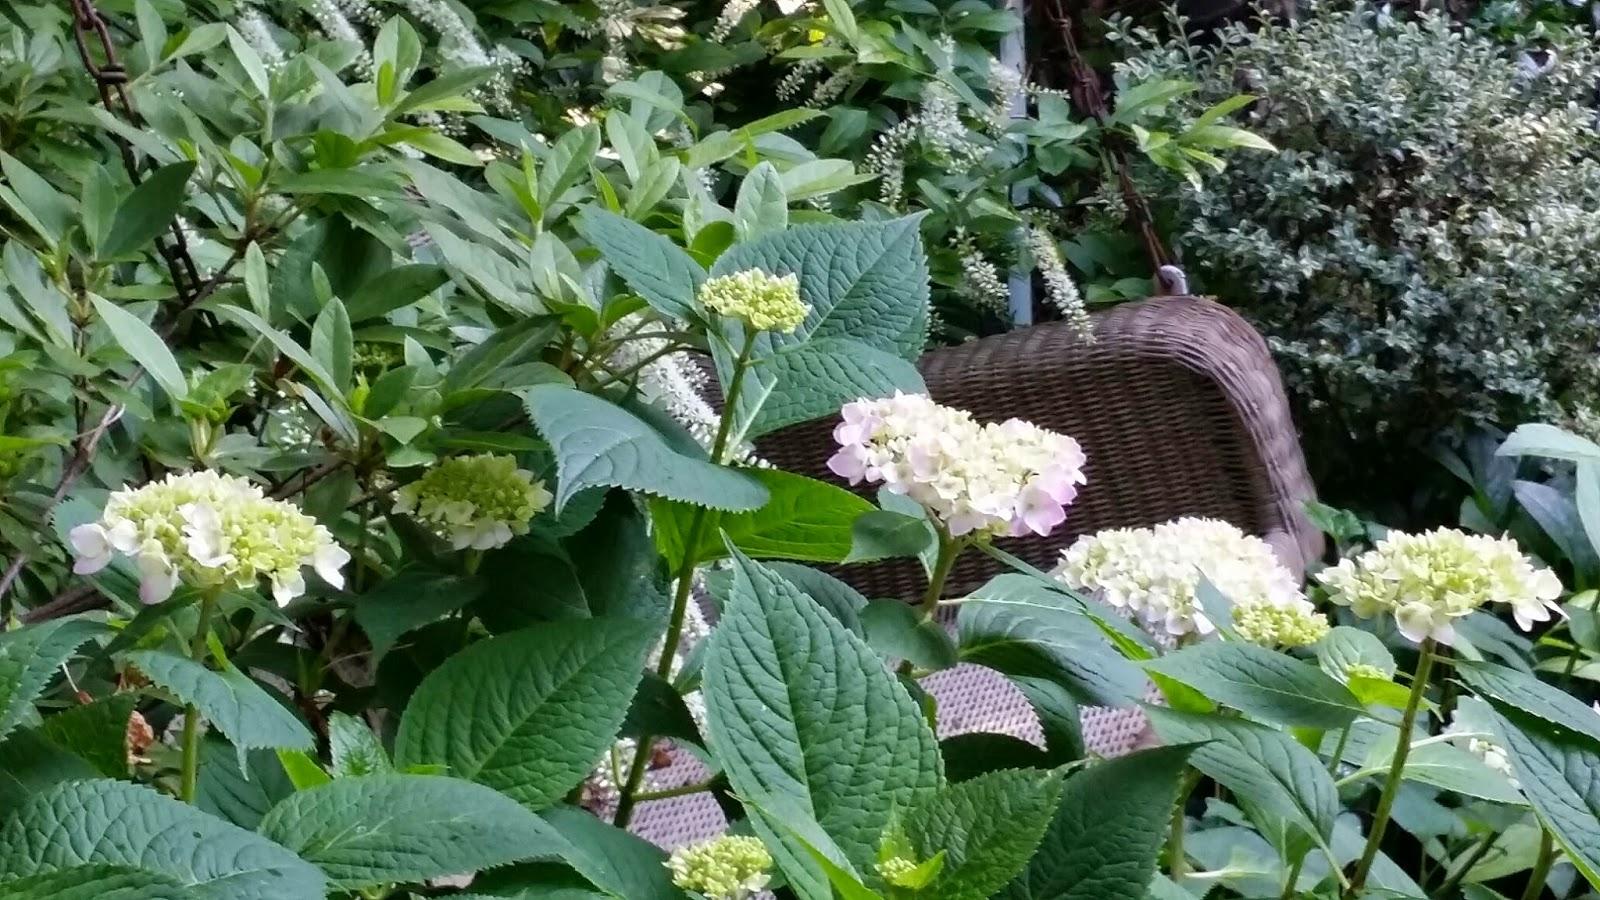 Tara dillard howard 39 s end hydrangeas for Garden designs with hydrangeas